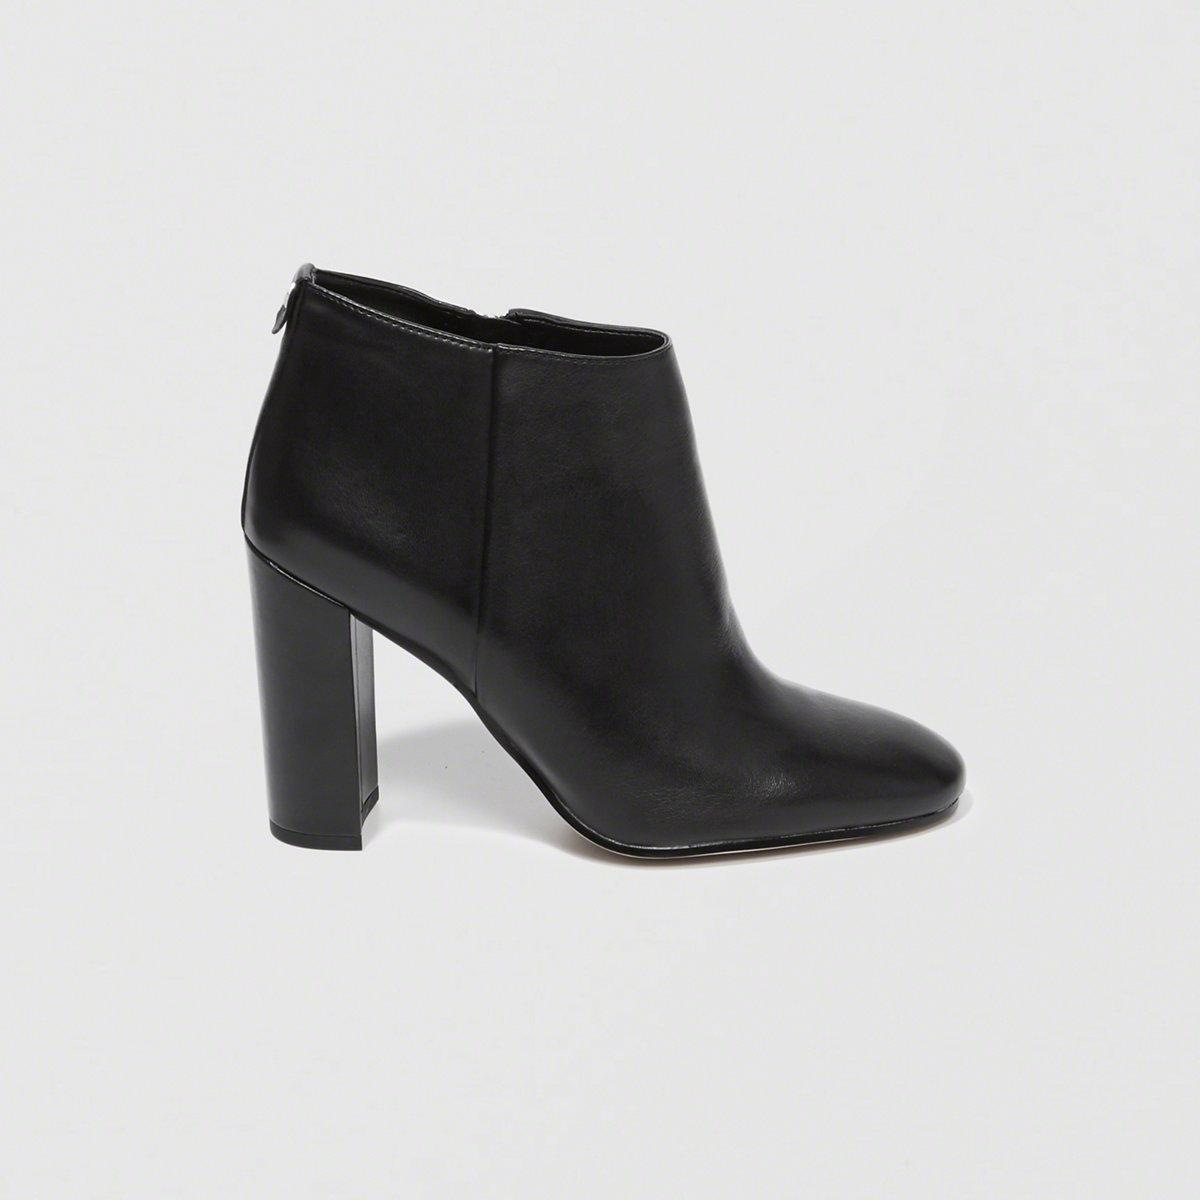 e64591baa1c97 Lyst - Sam Edelman Cambell Booties in Black